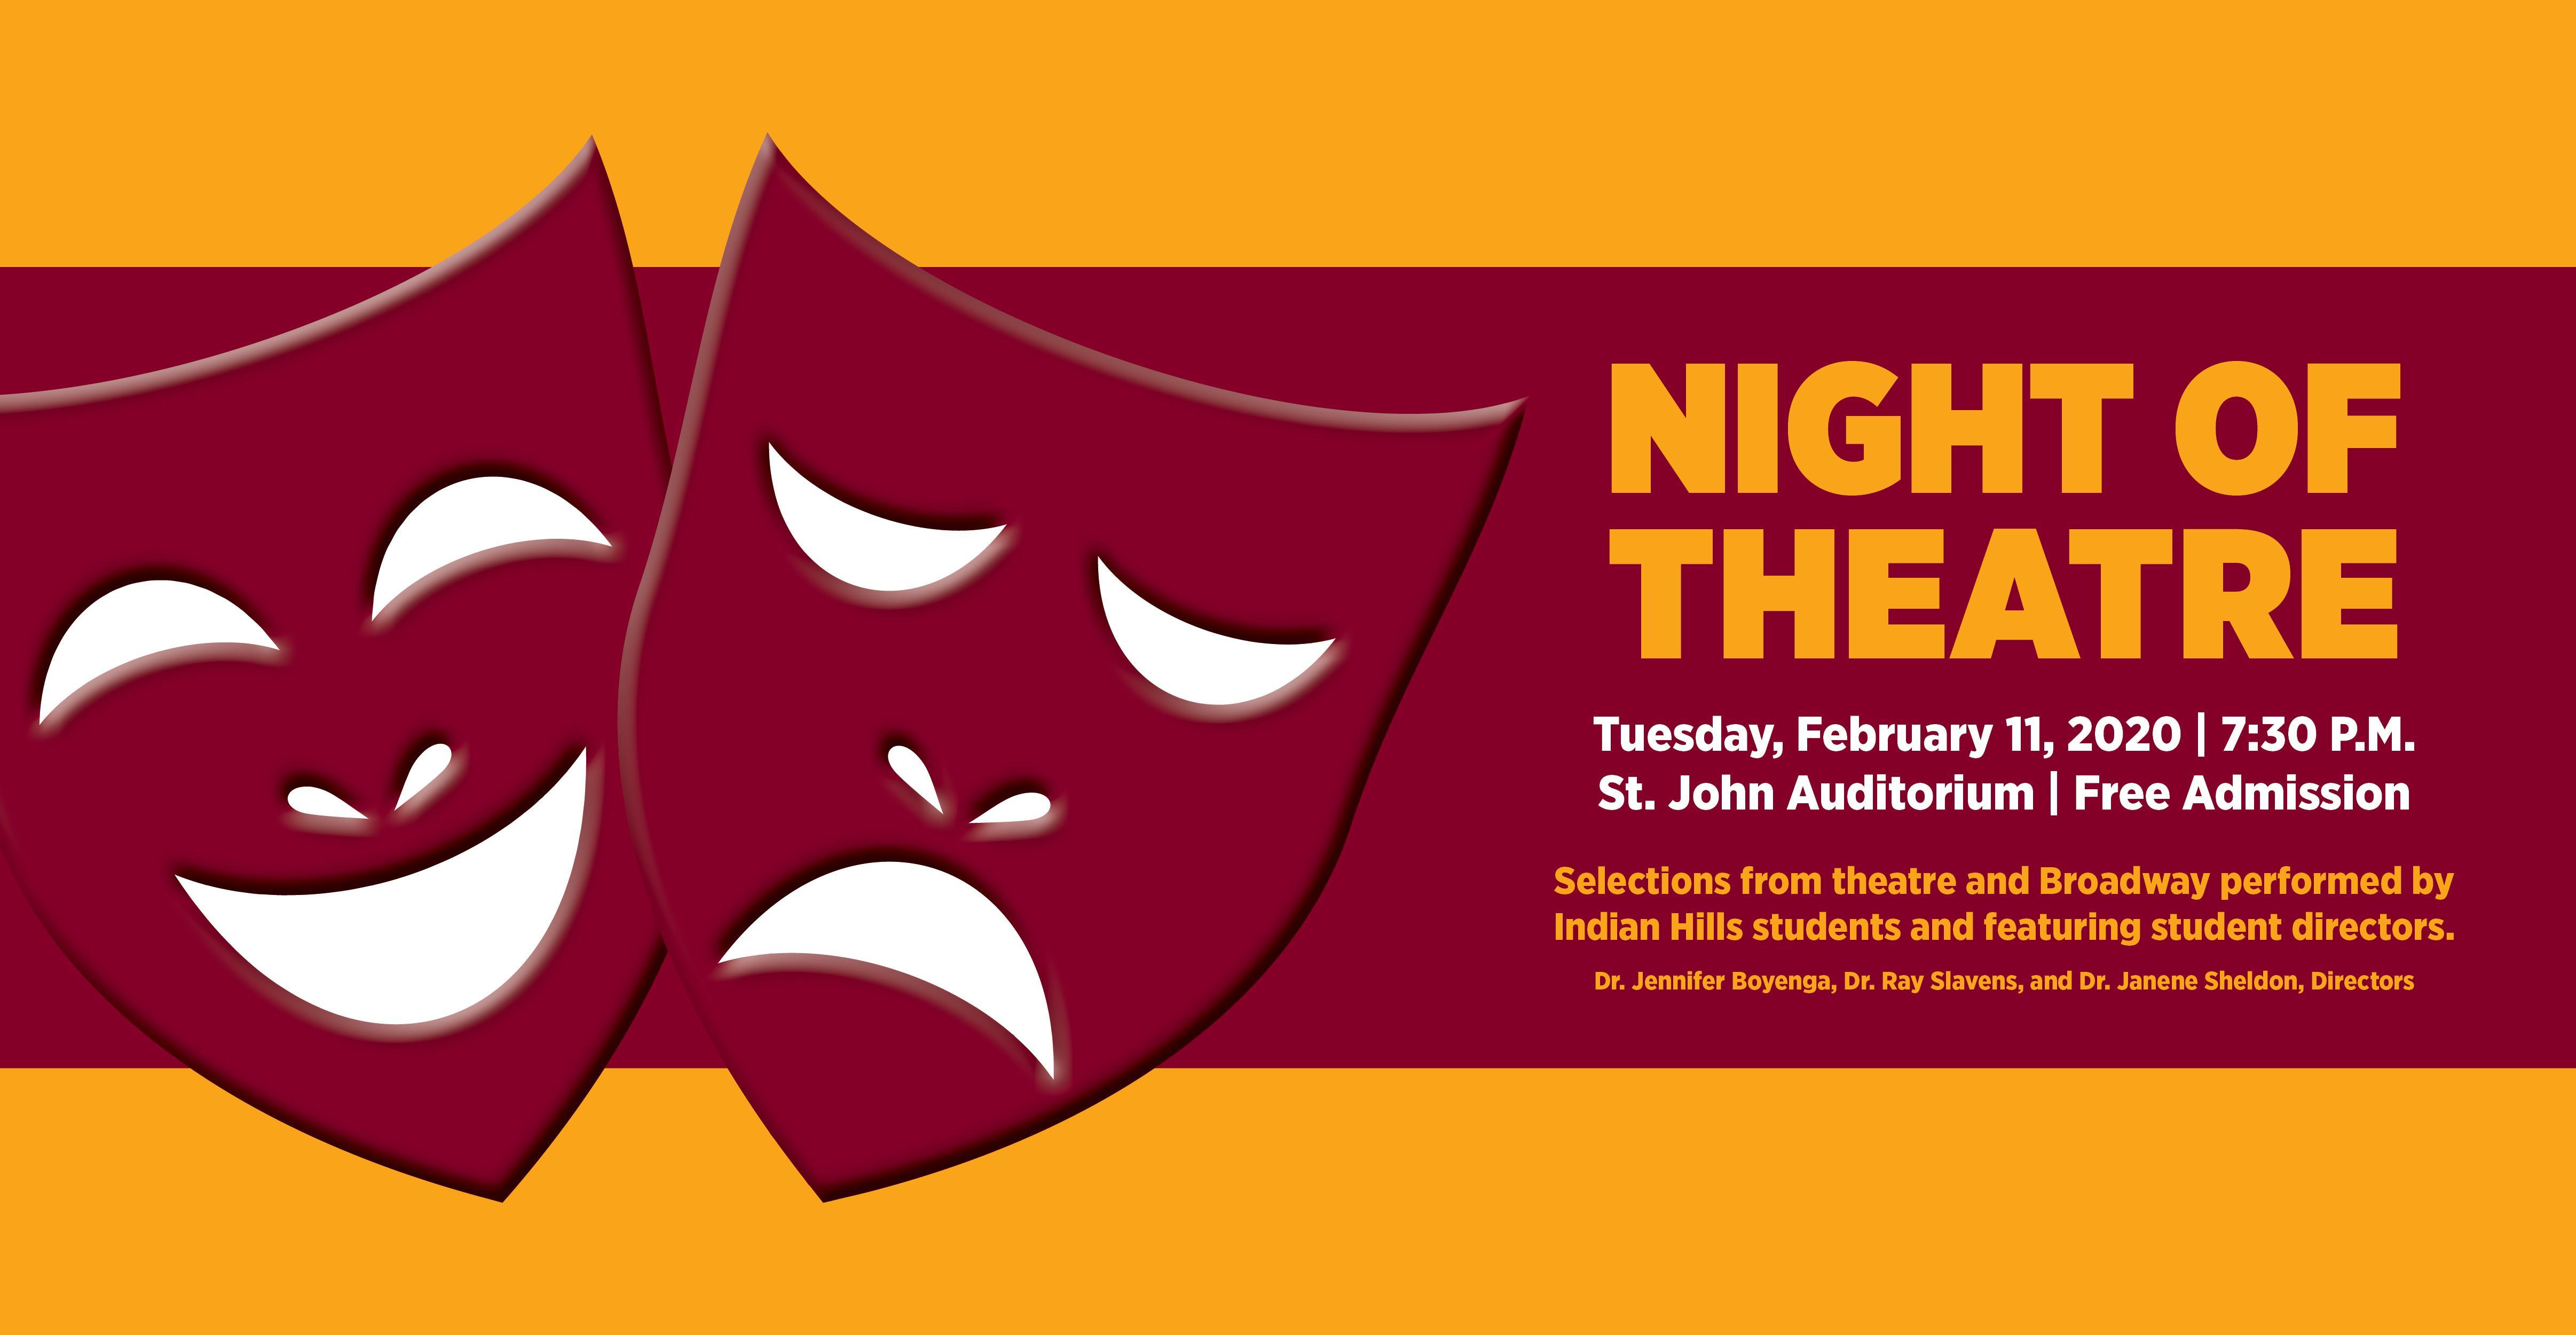 Night of Theatre